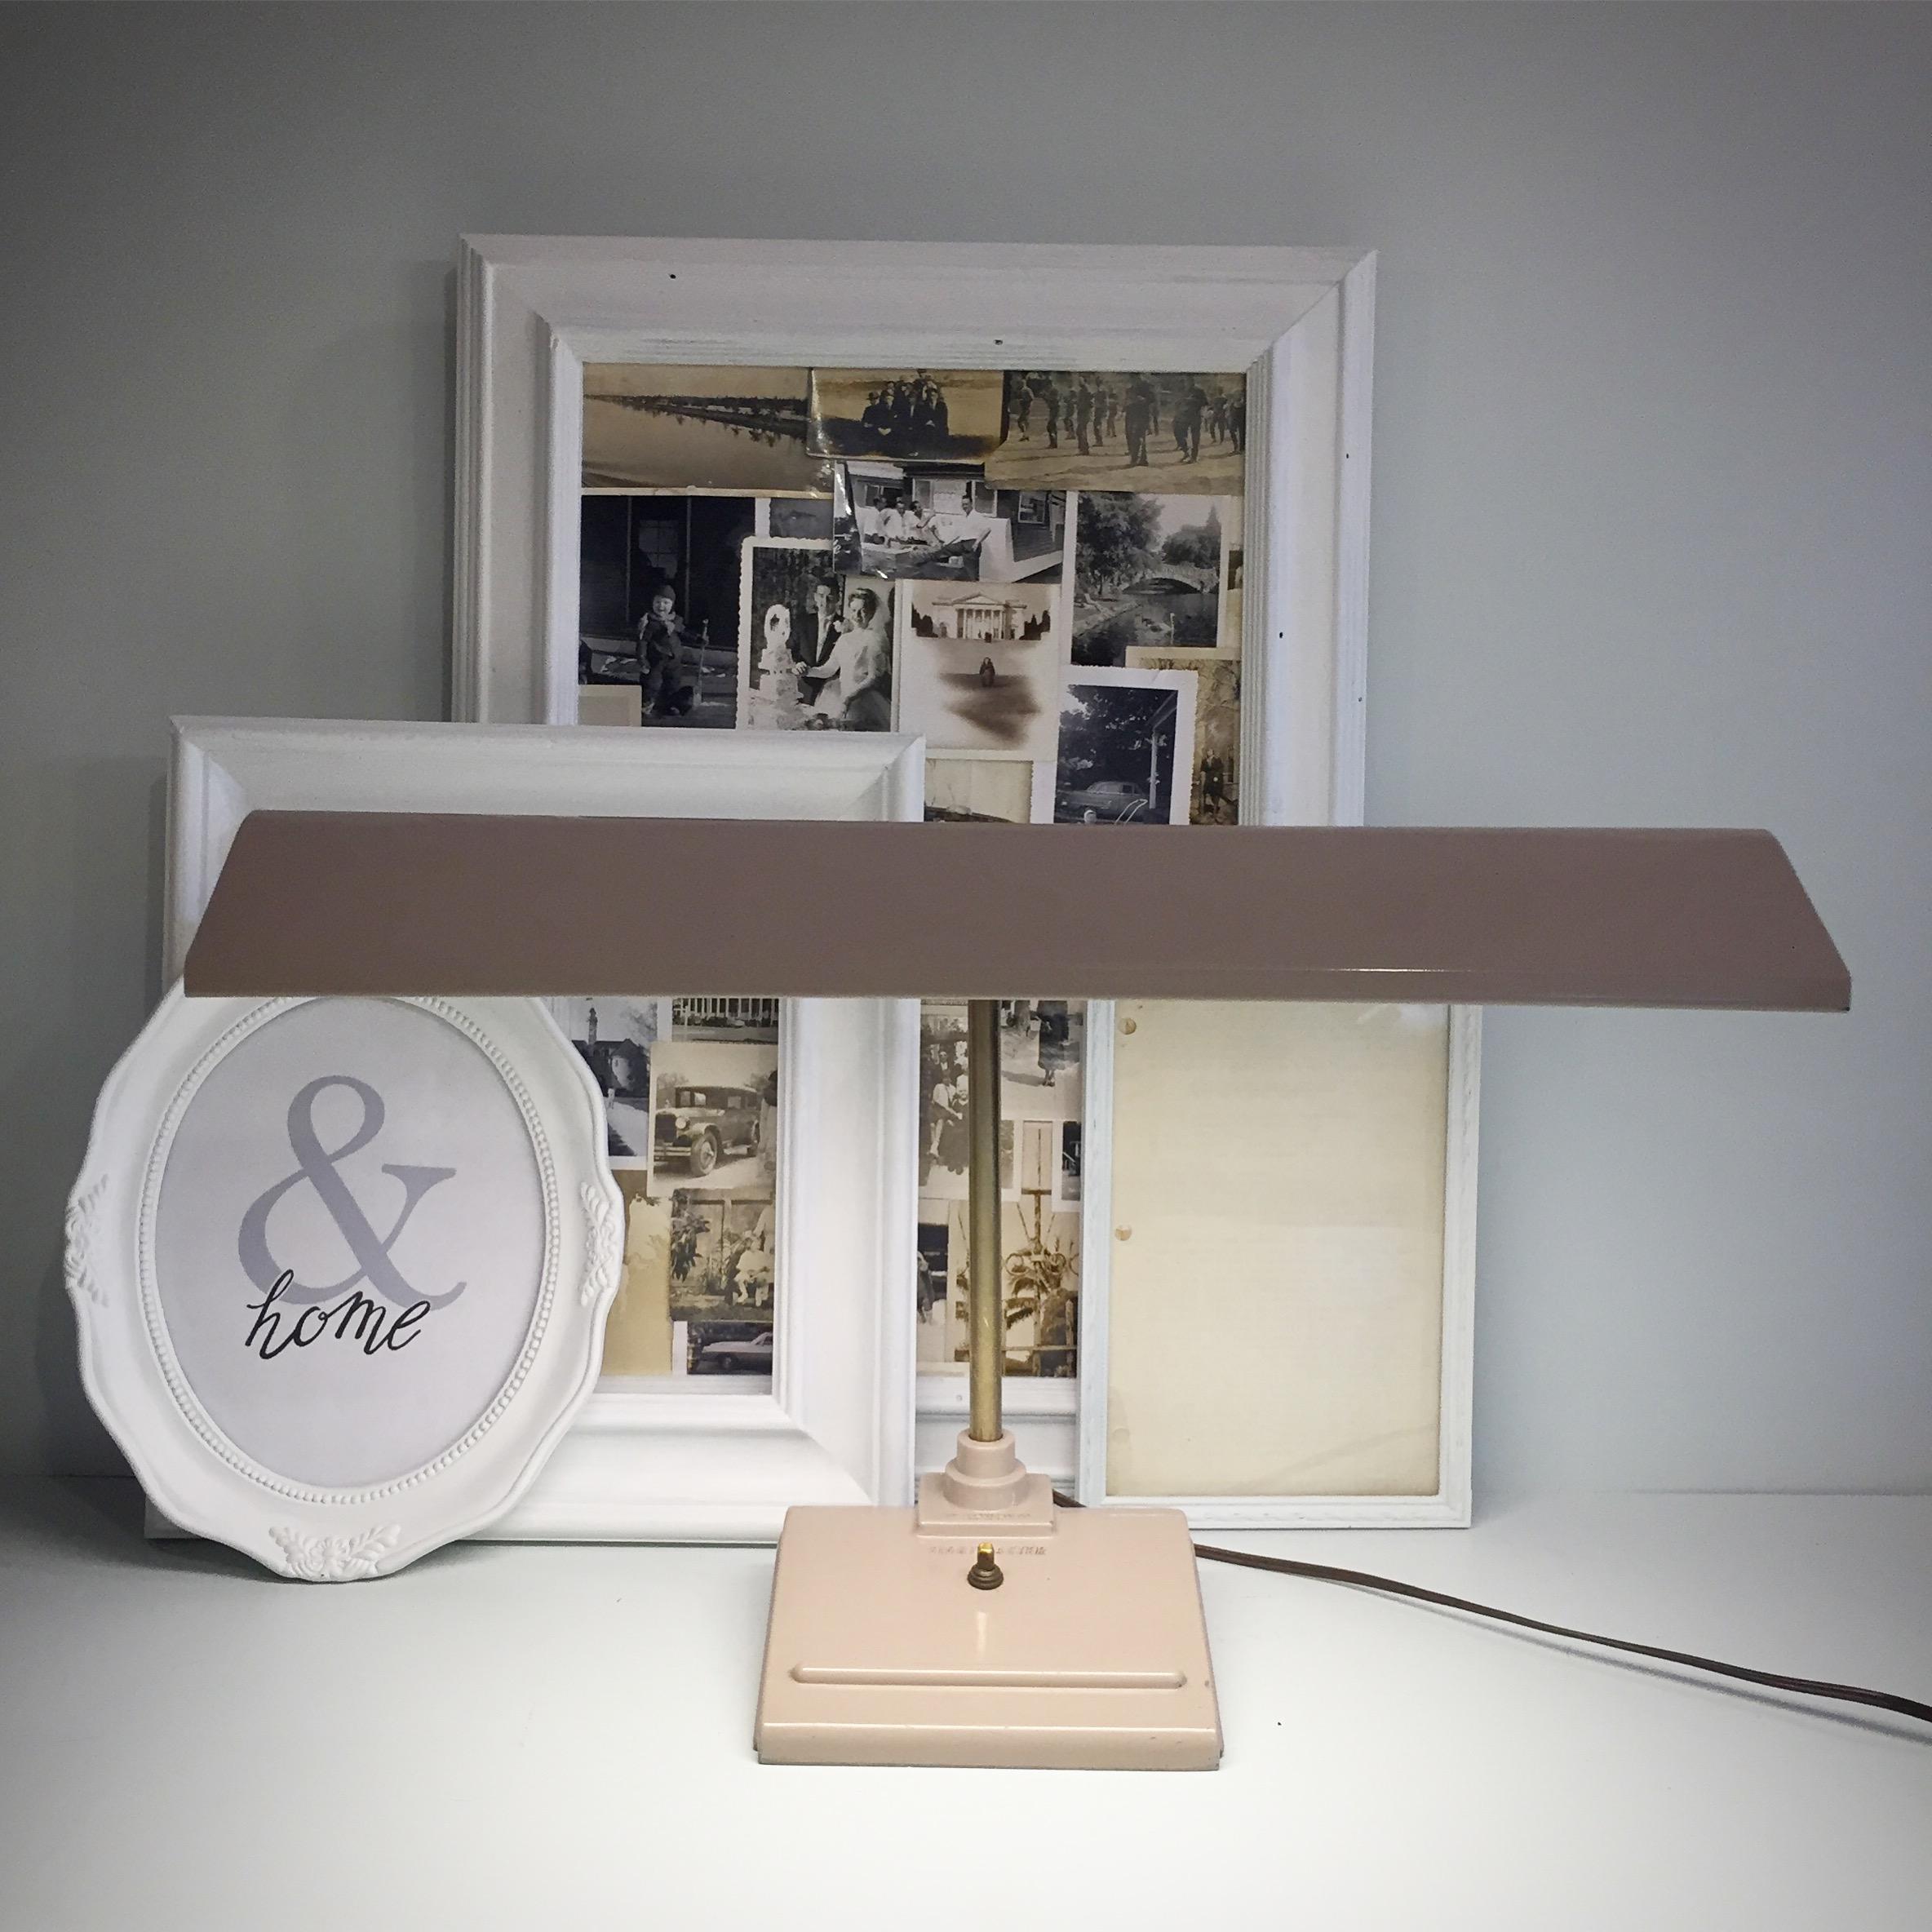 desk lamp | $45